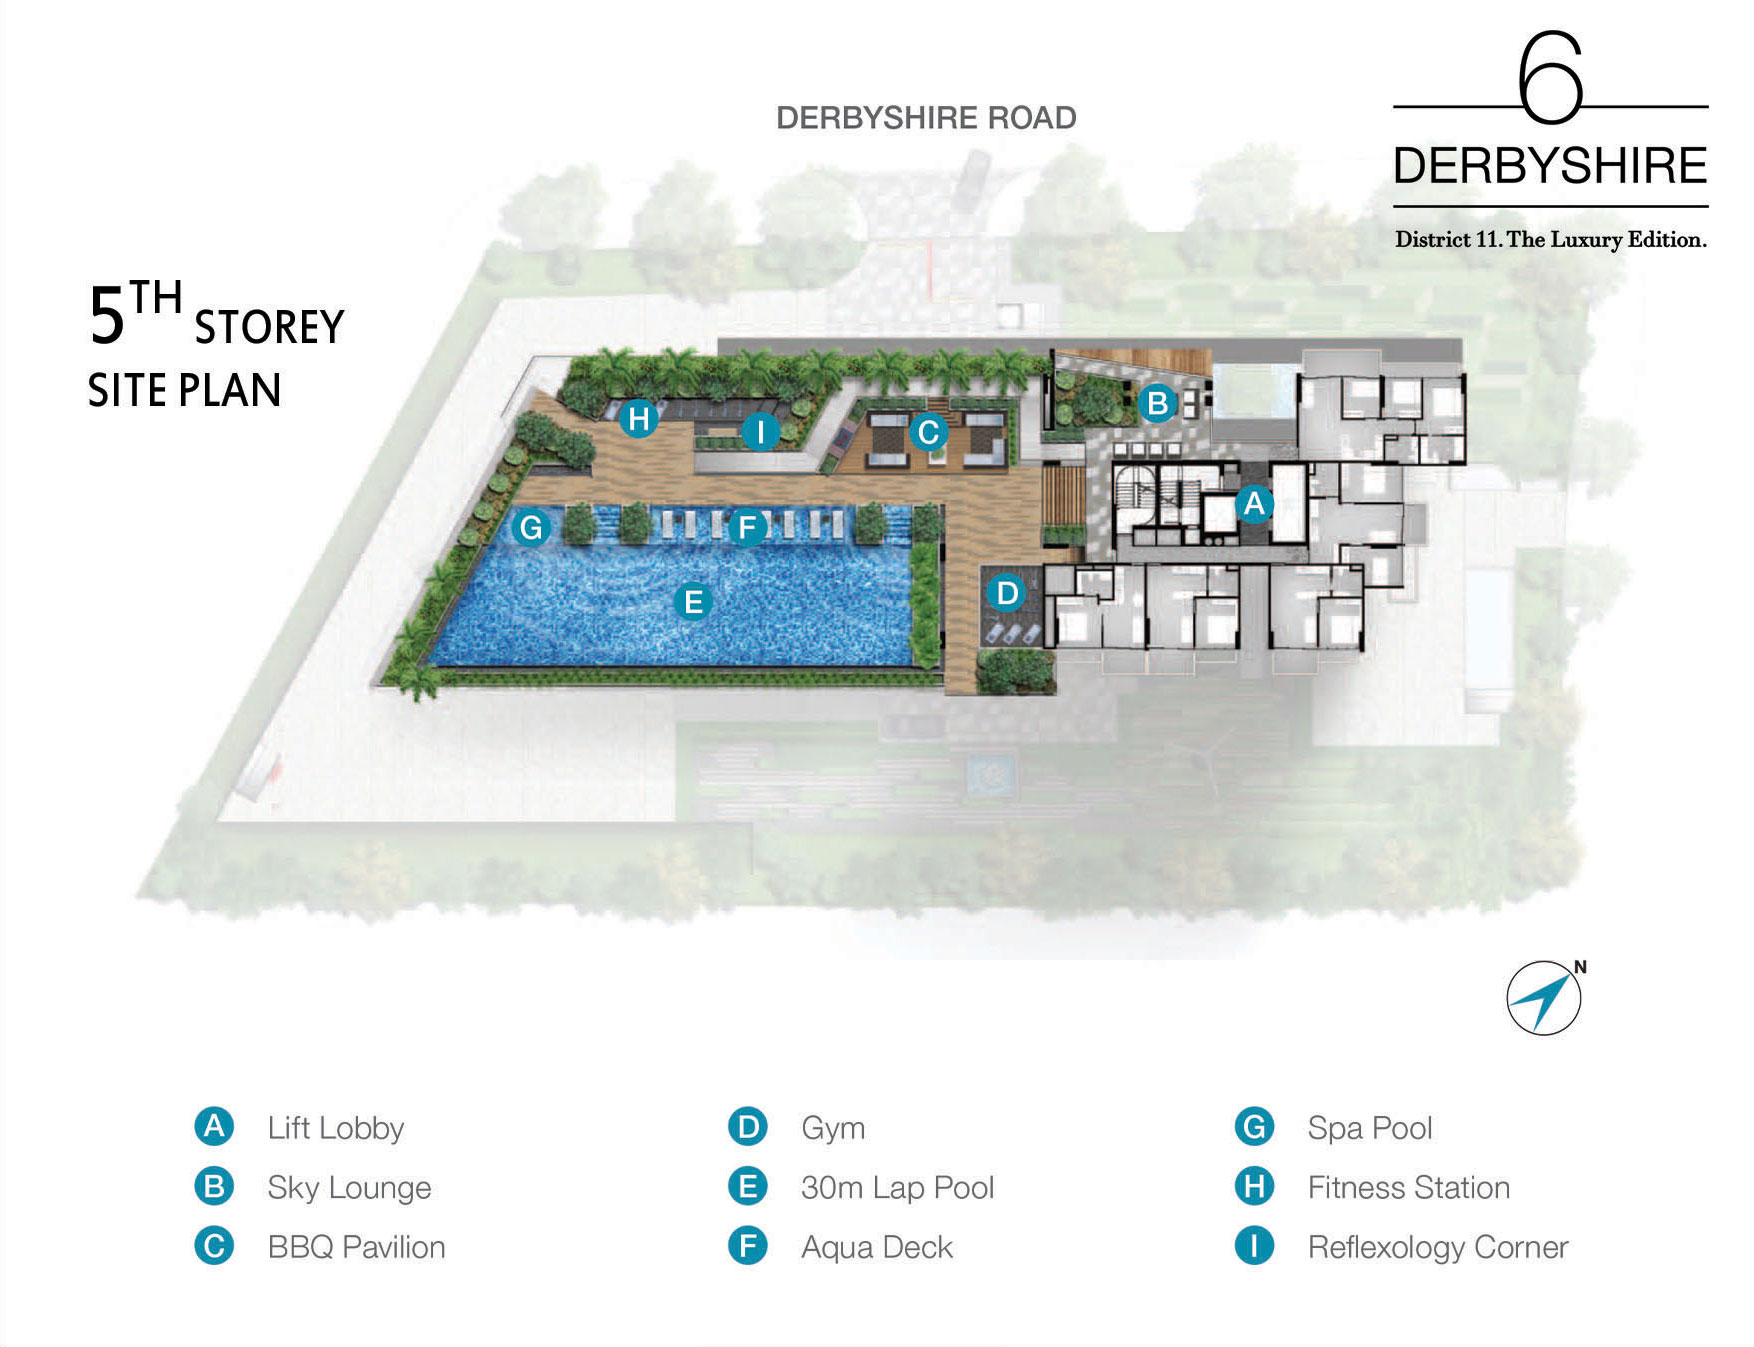 6-Derbyshire-Site-Plan-Level5